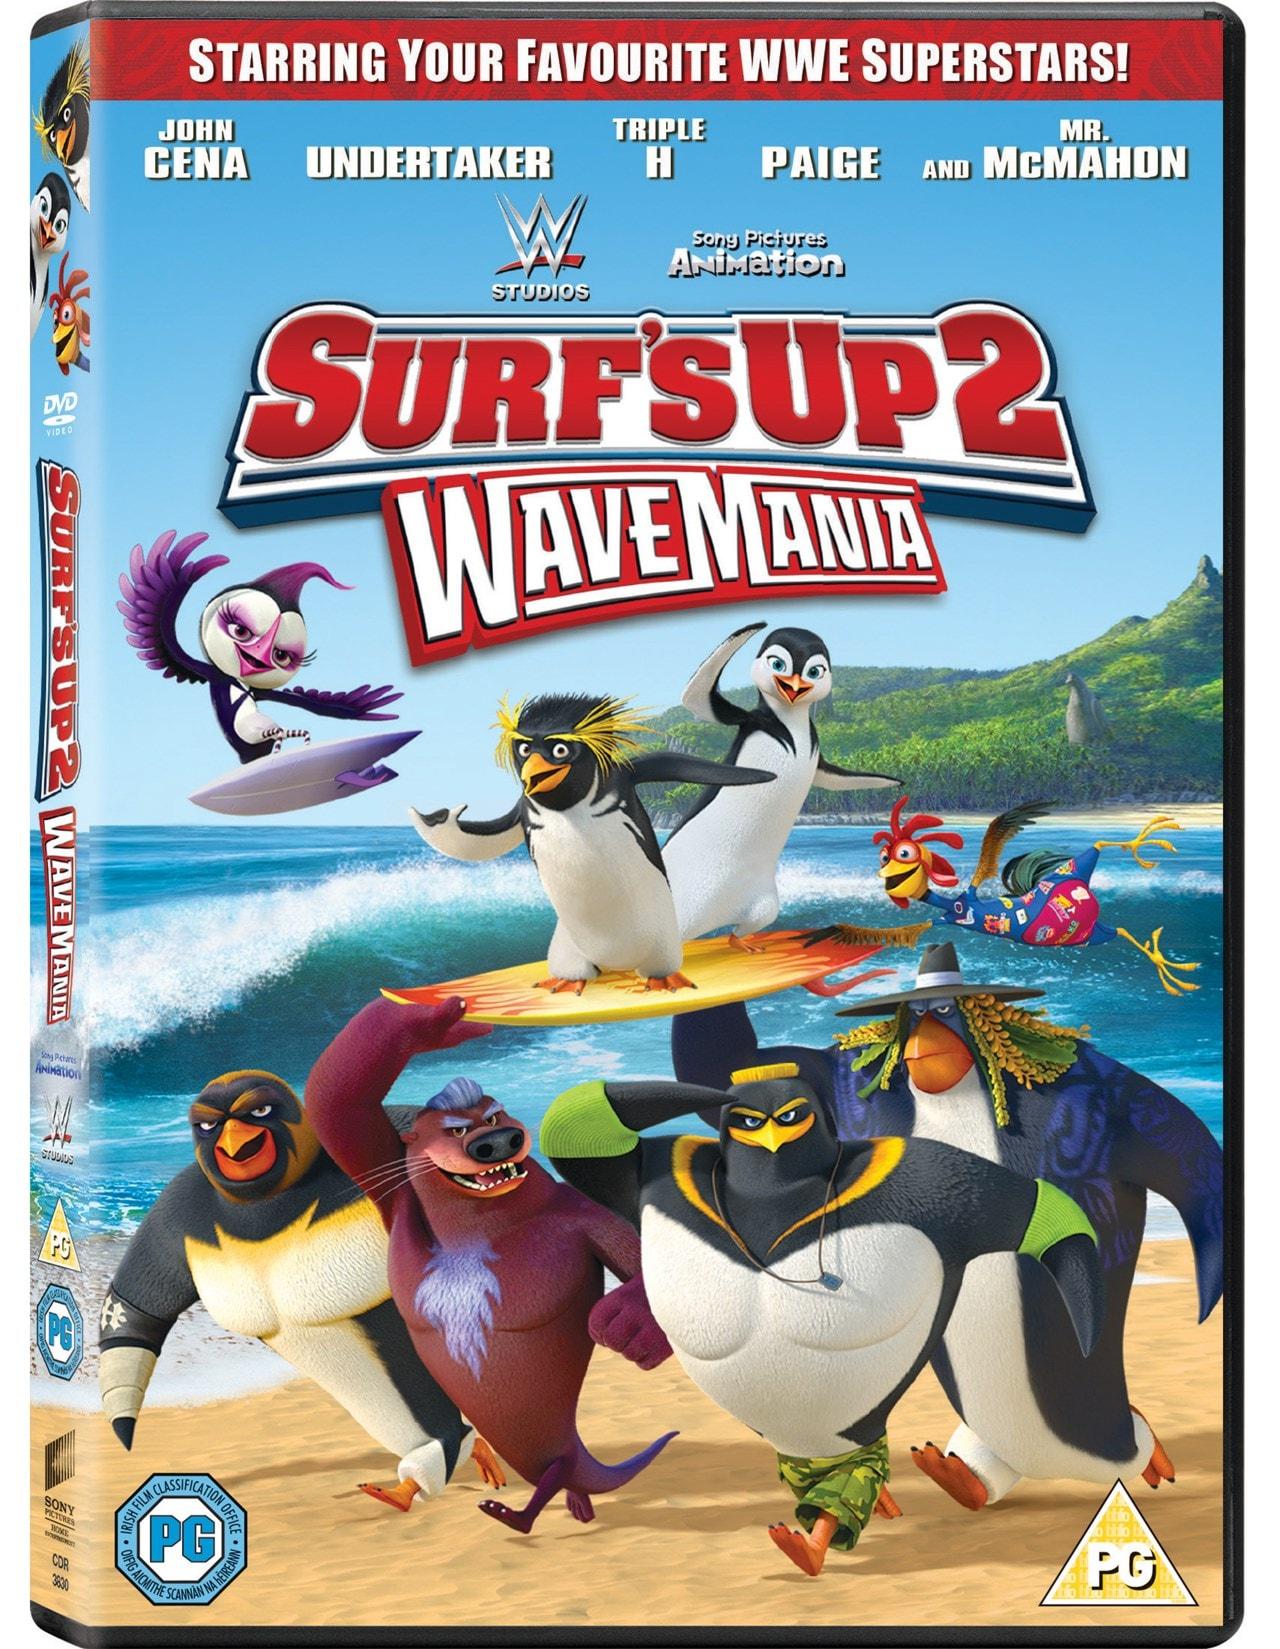 Surf's Up 2 - WaveMania - 2